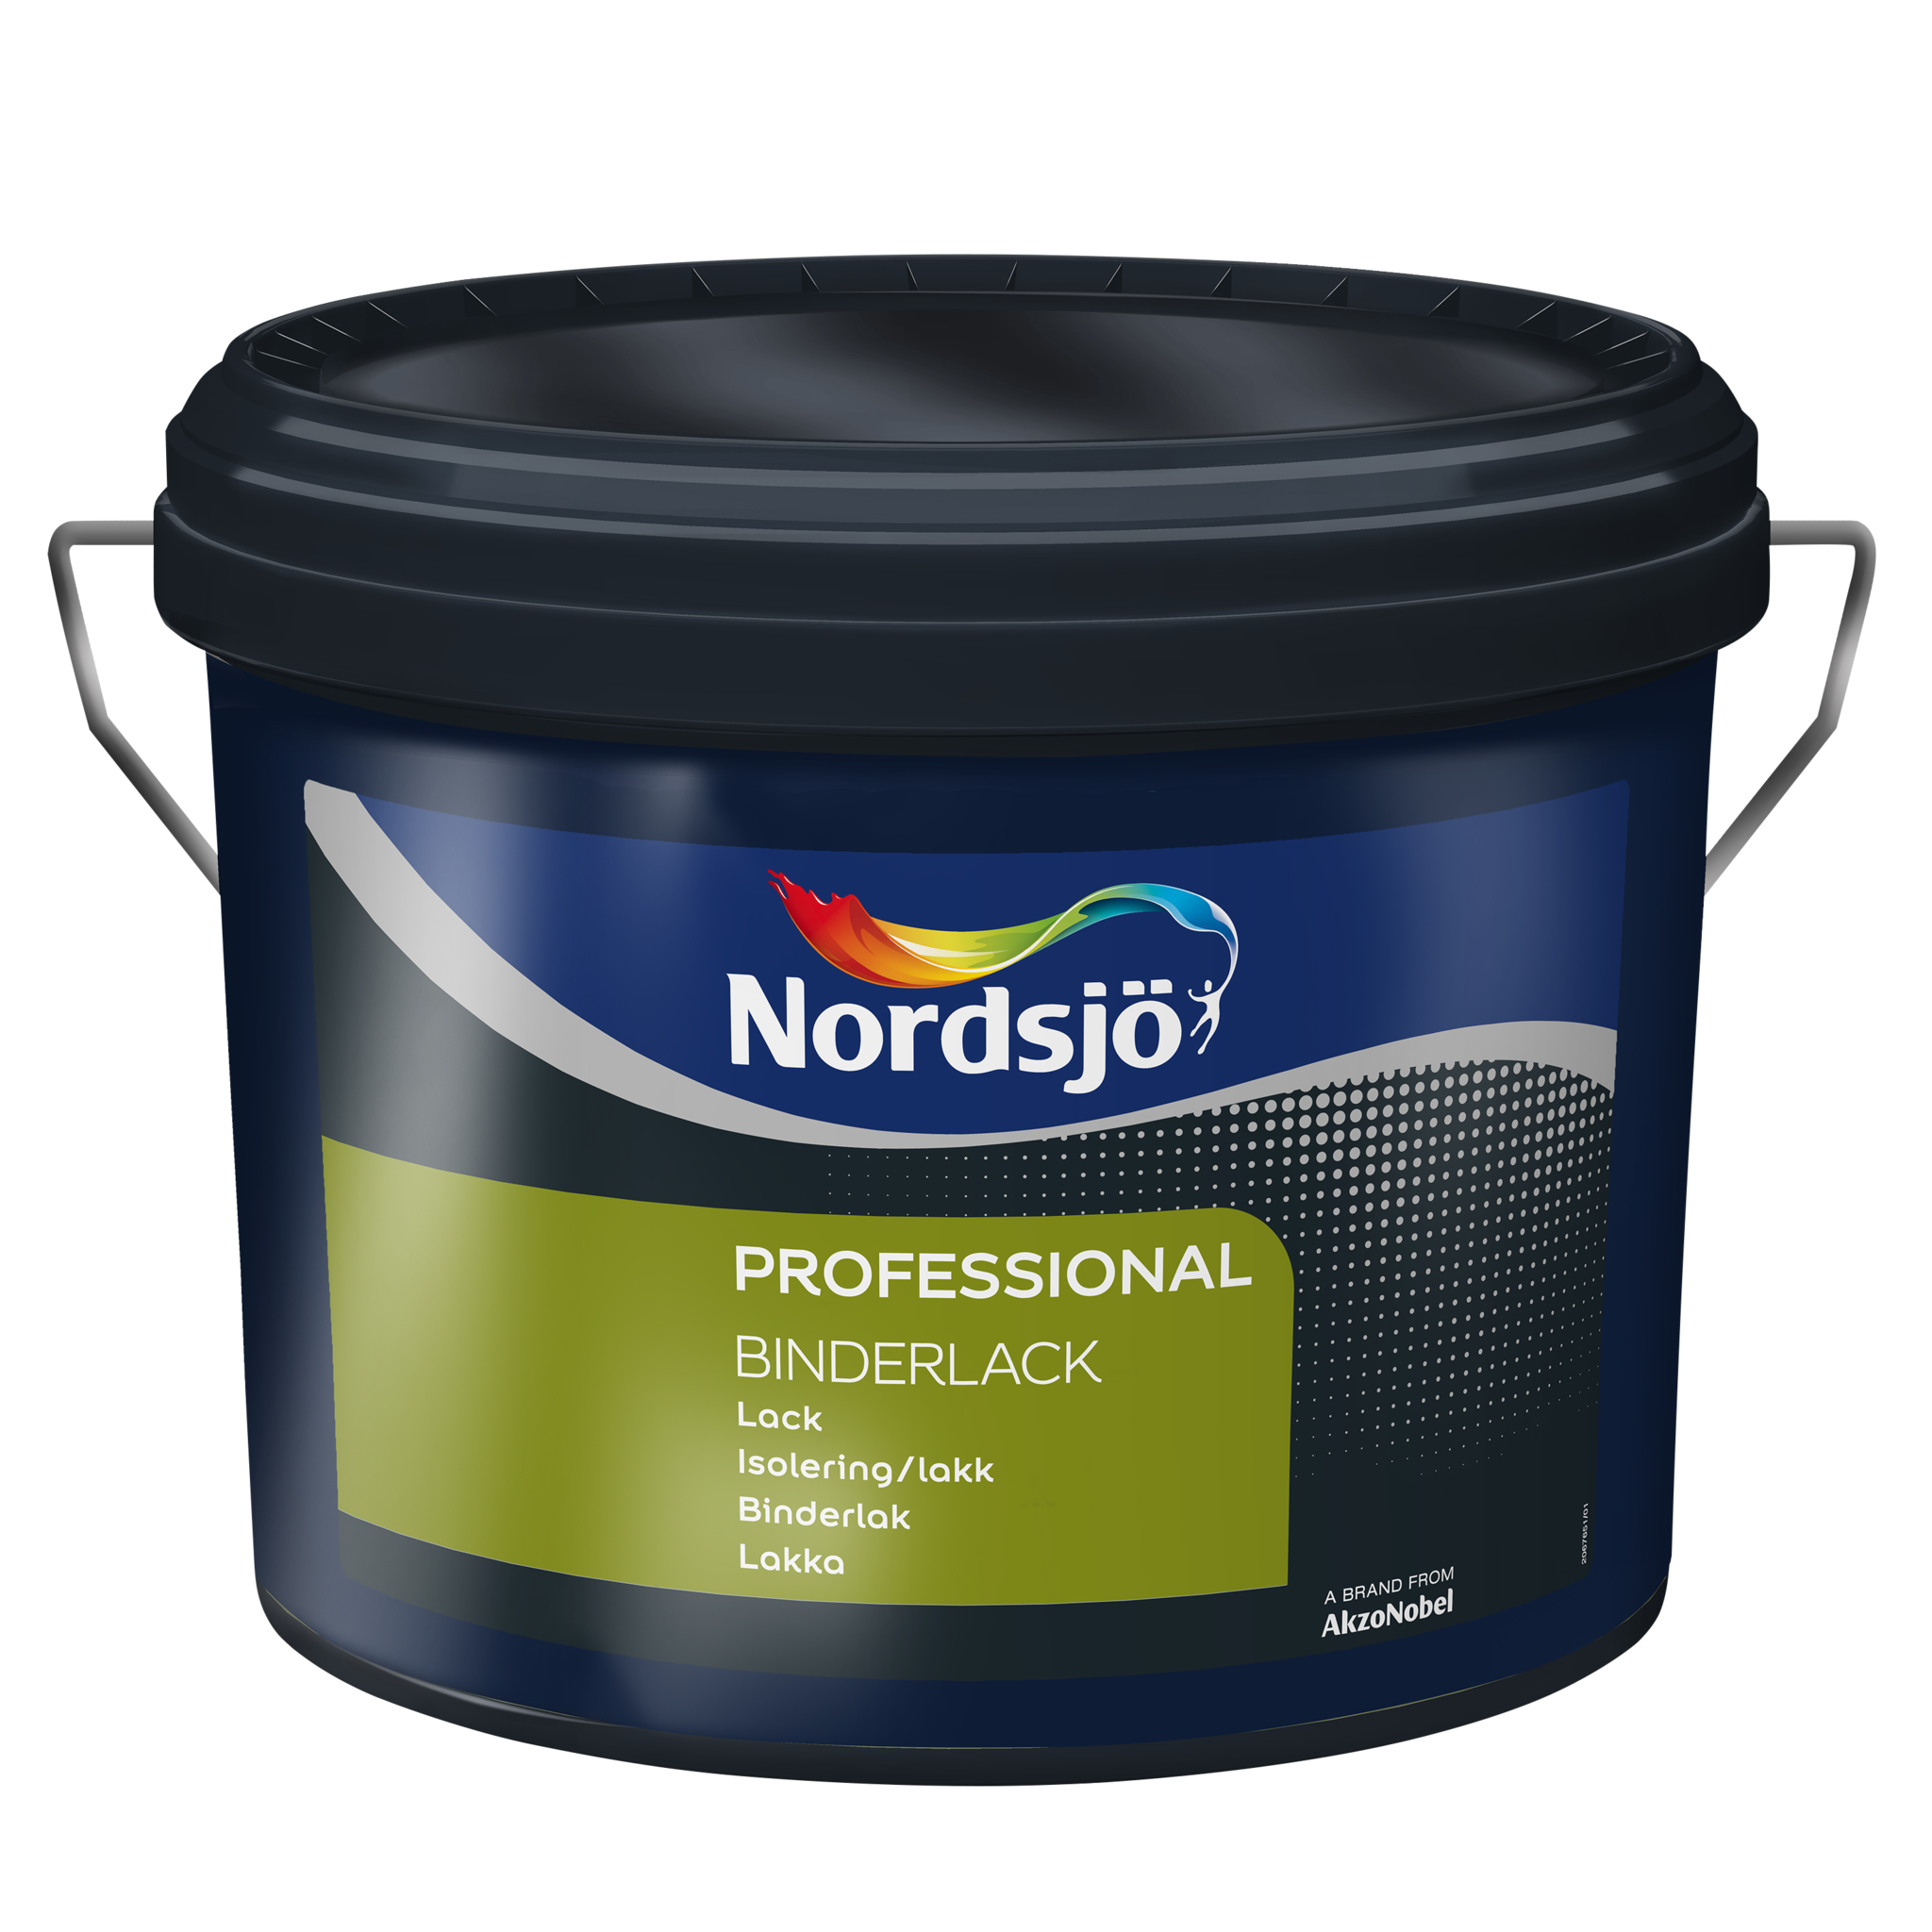 Professional binderlack   nordsjö idé & design